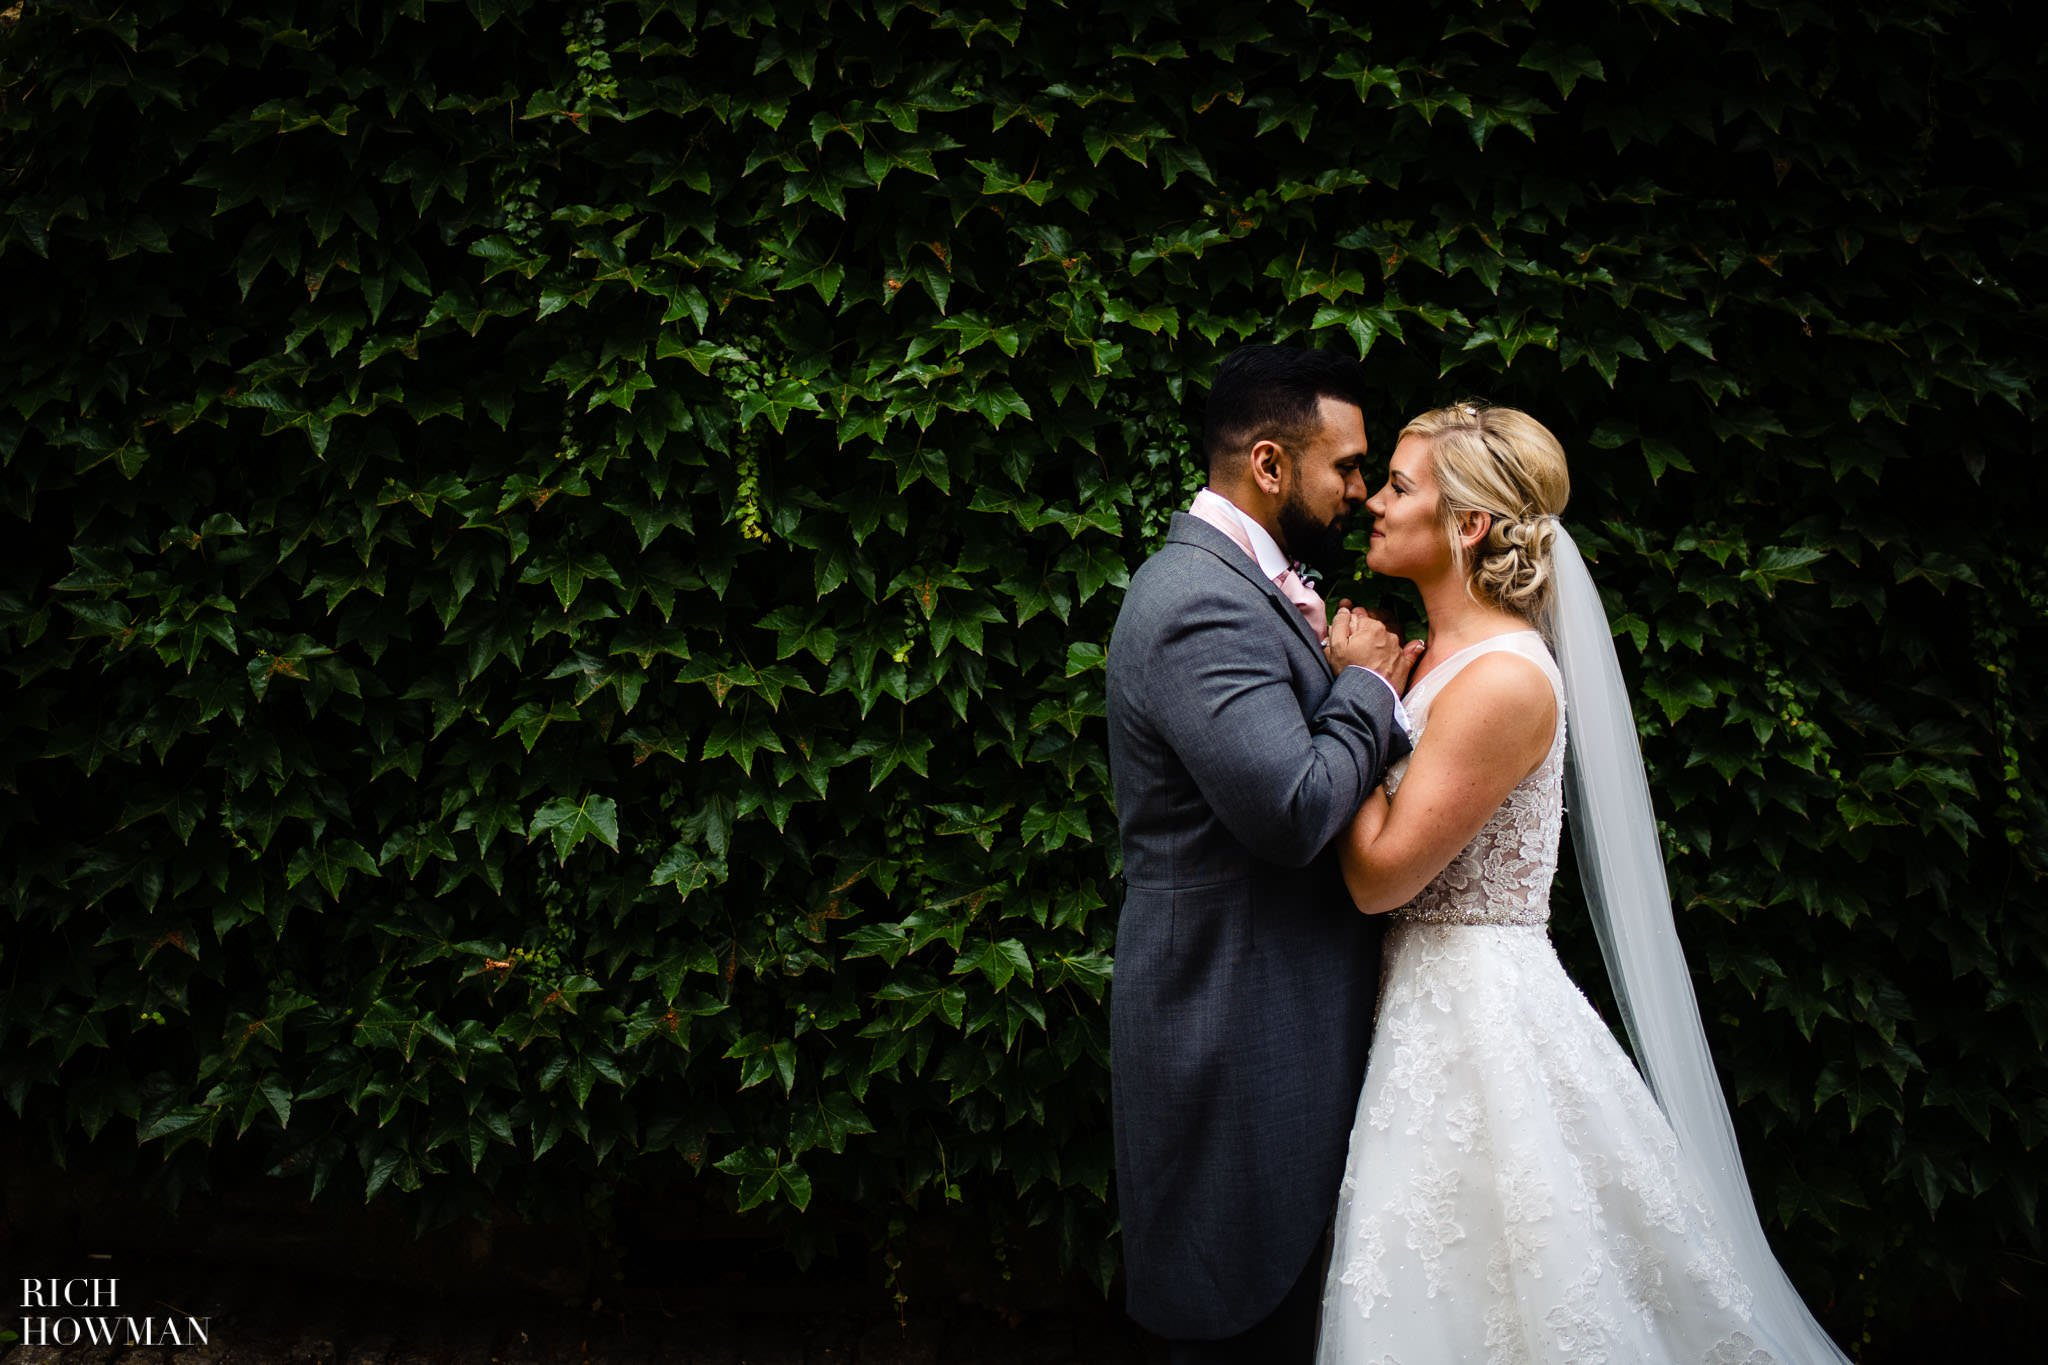 Wedding Photographers in Oxfordshire | Wedding Photographers Witney 395